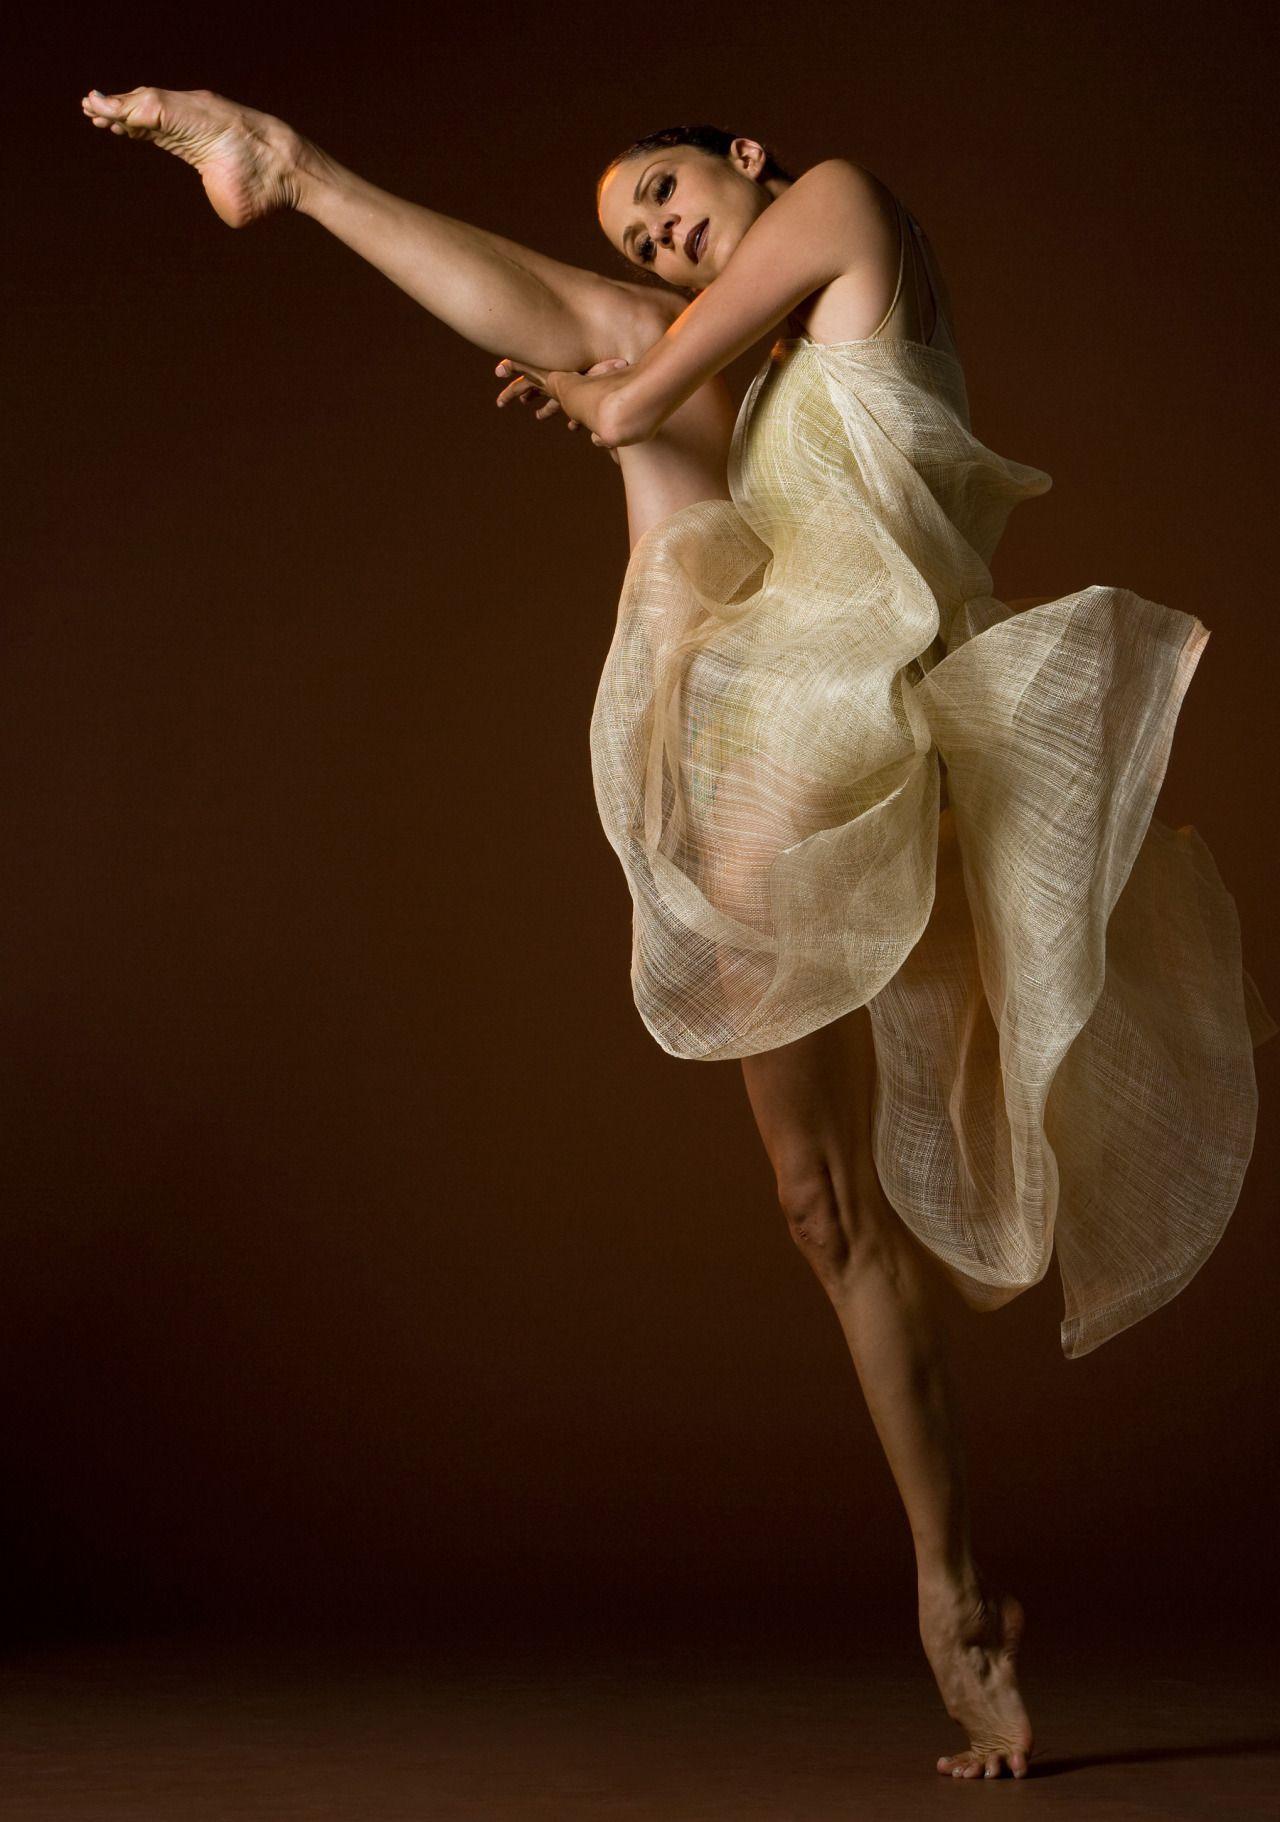 Nude Dance Hd